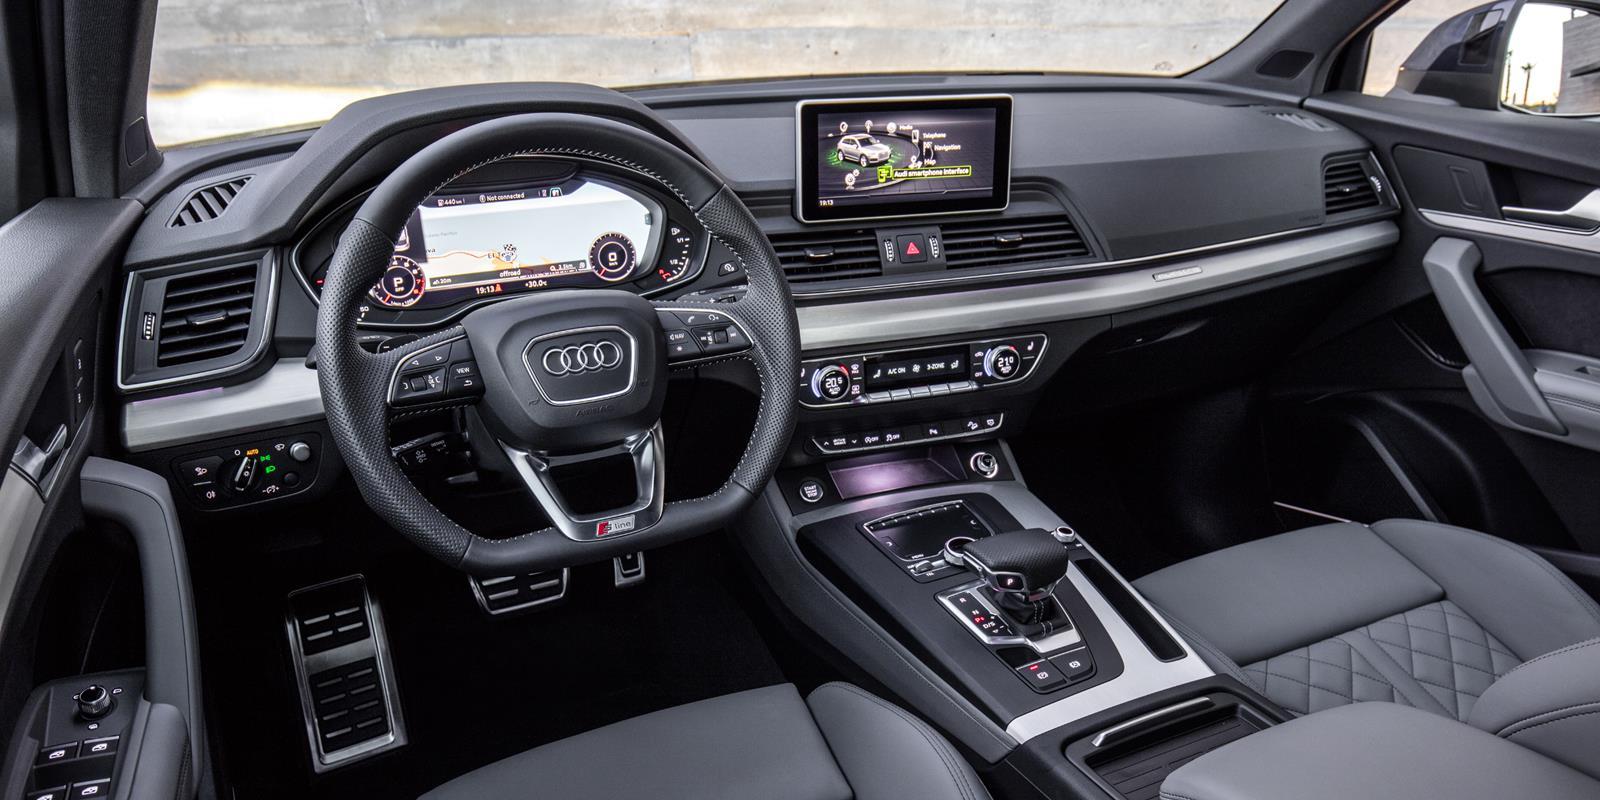 Audi Q5 photo 171922